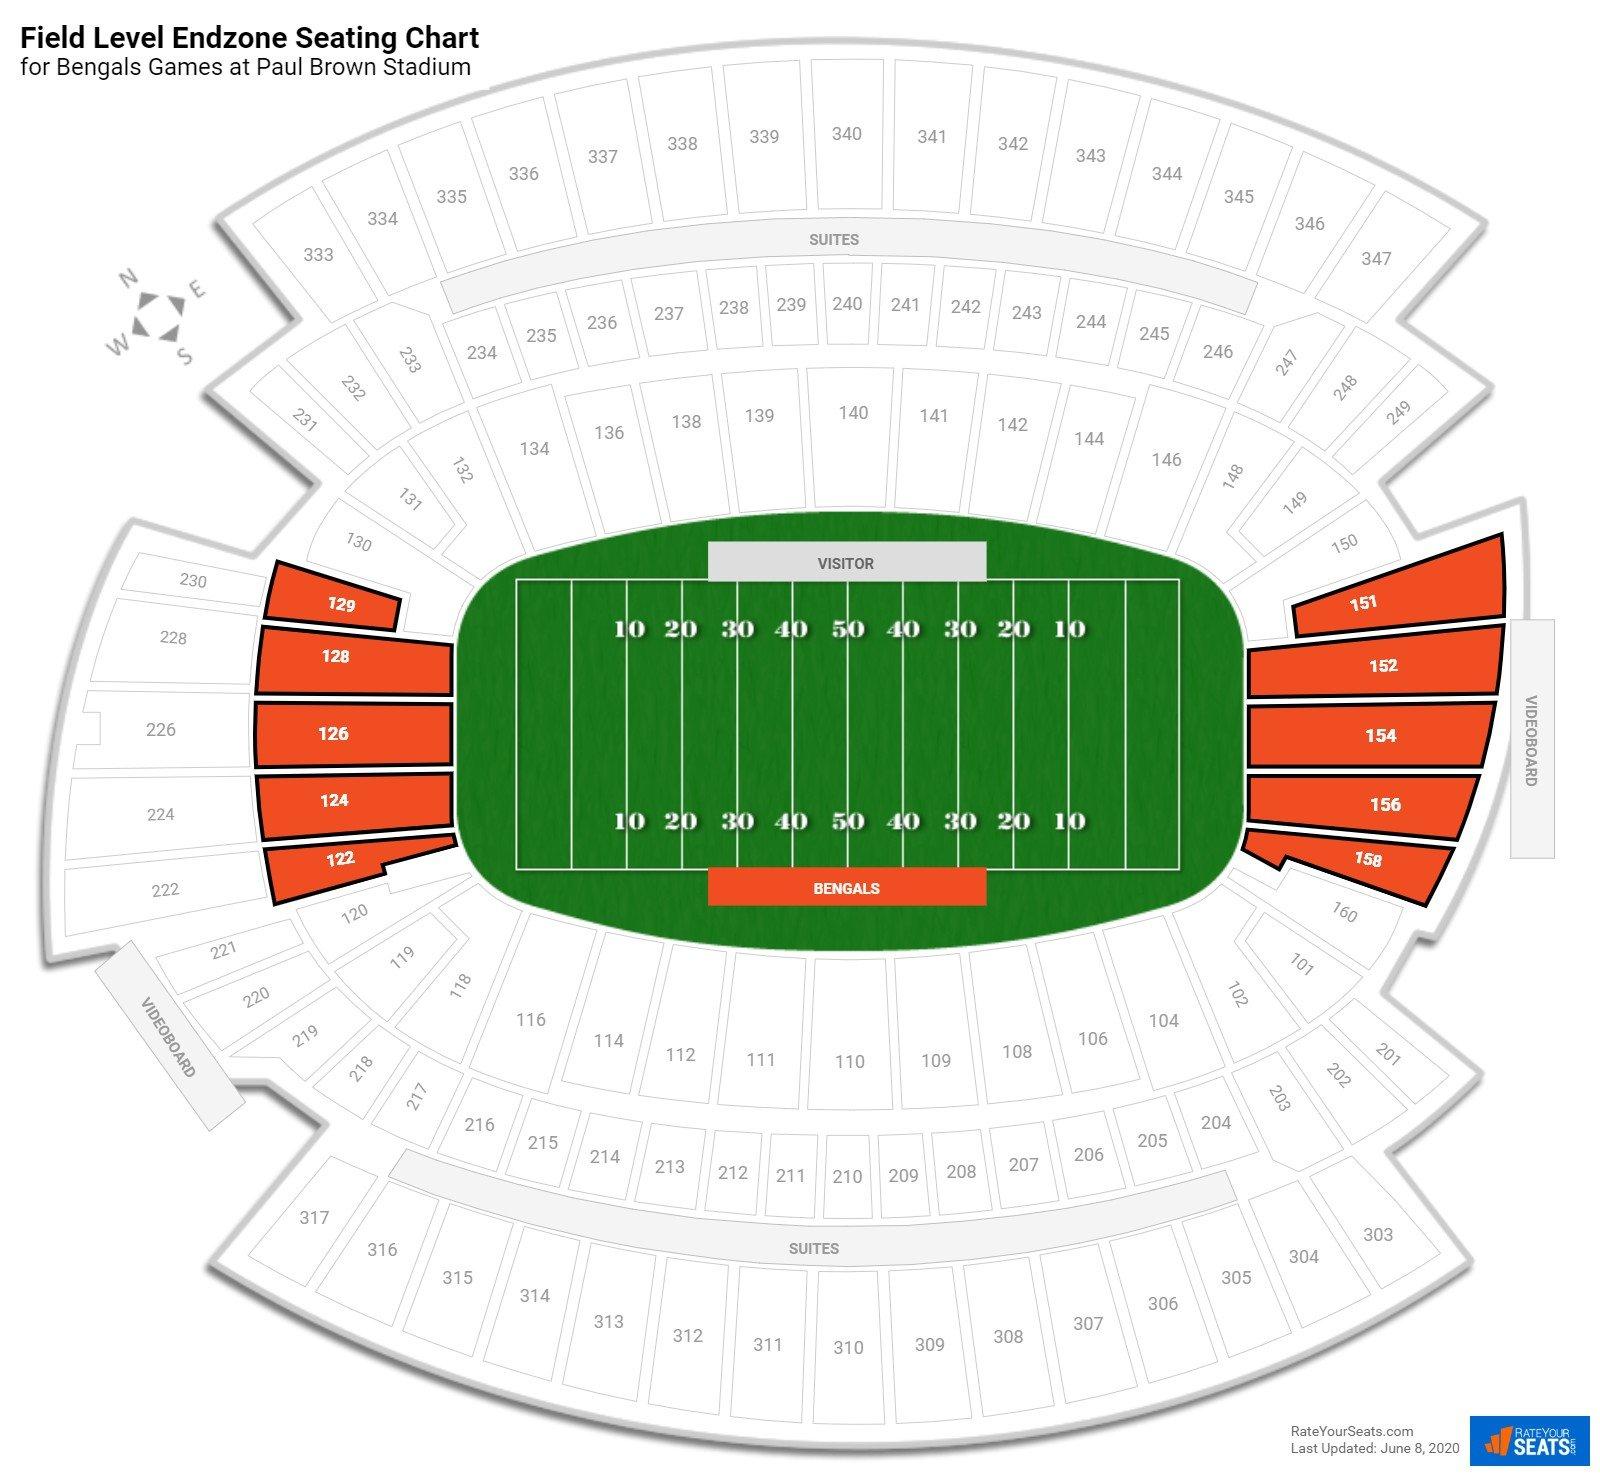 Field Level Endzone Paul Brown Stadium Football Seating